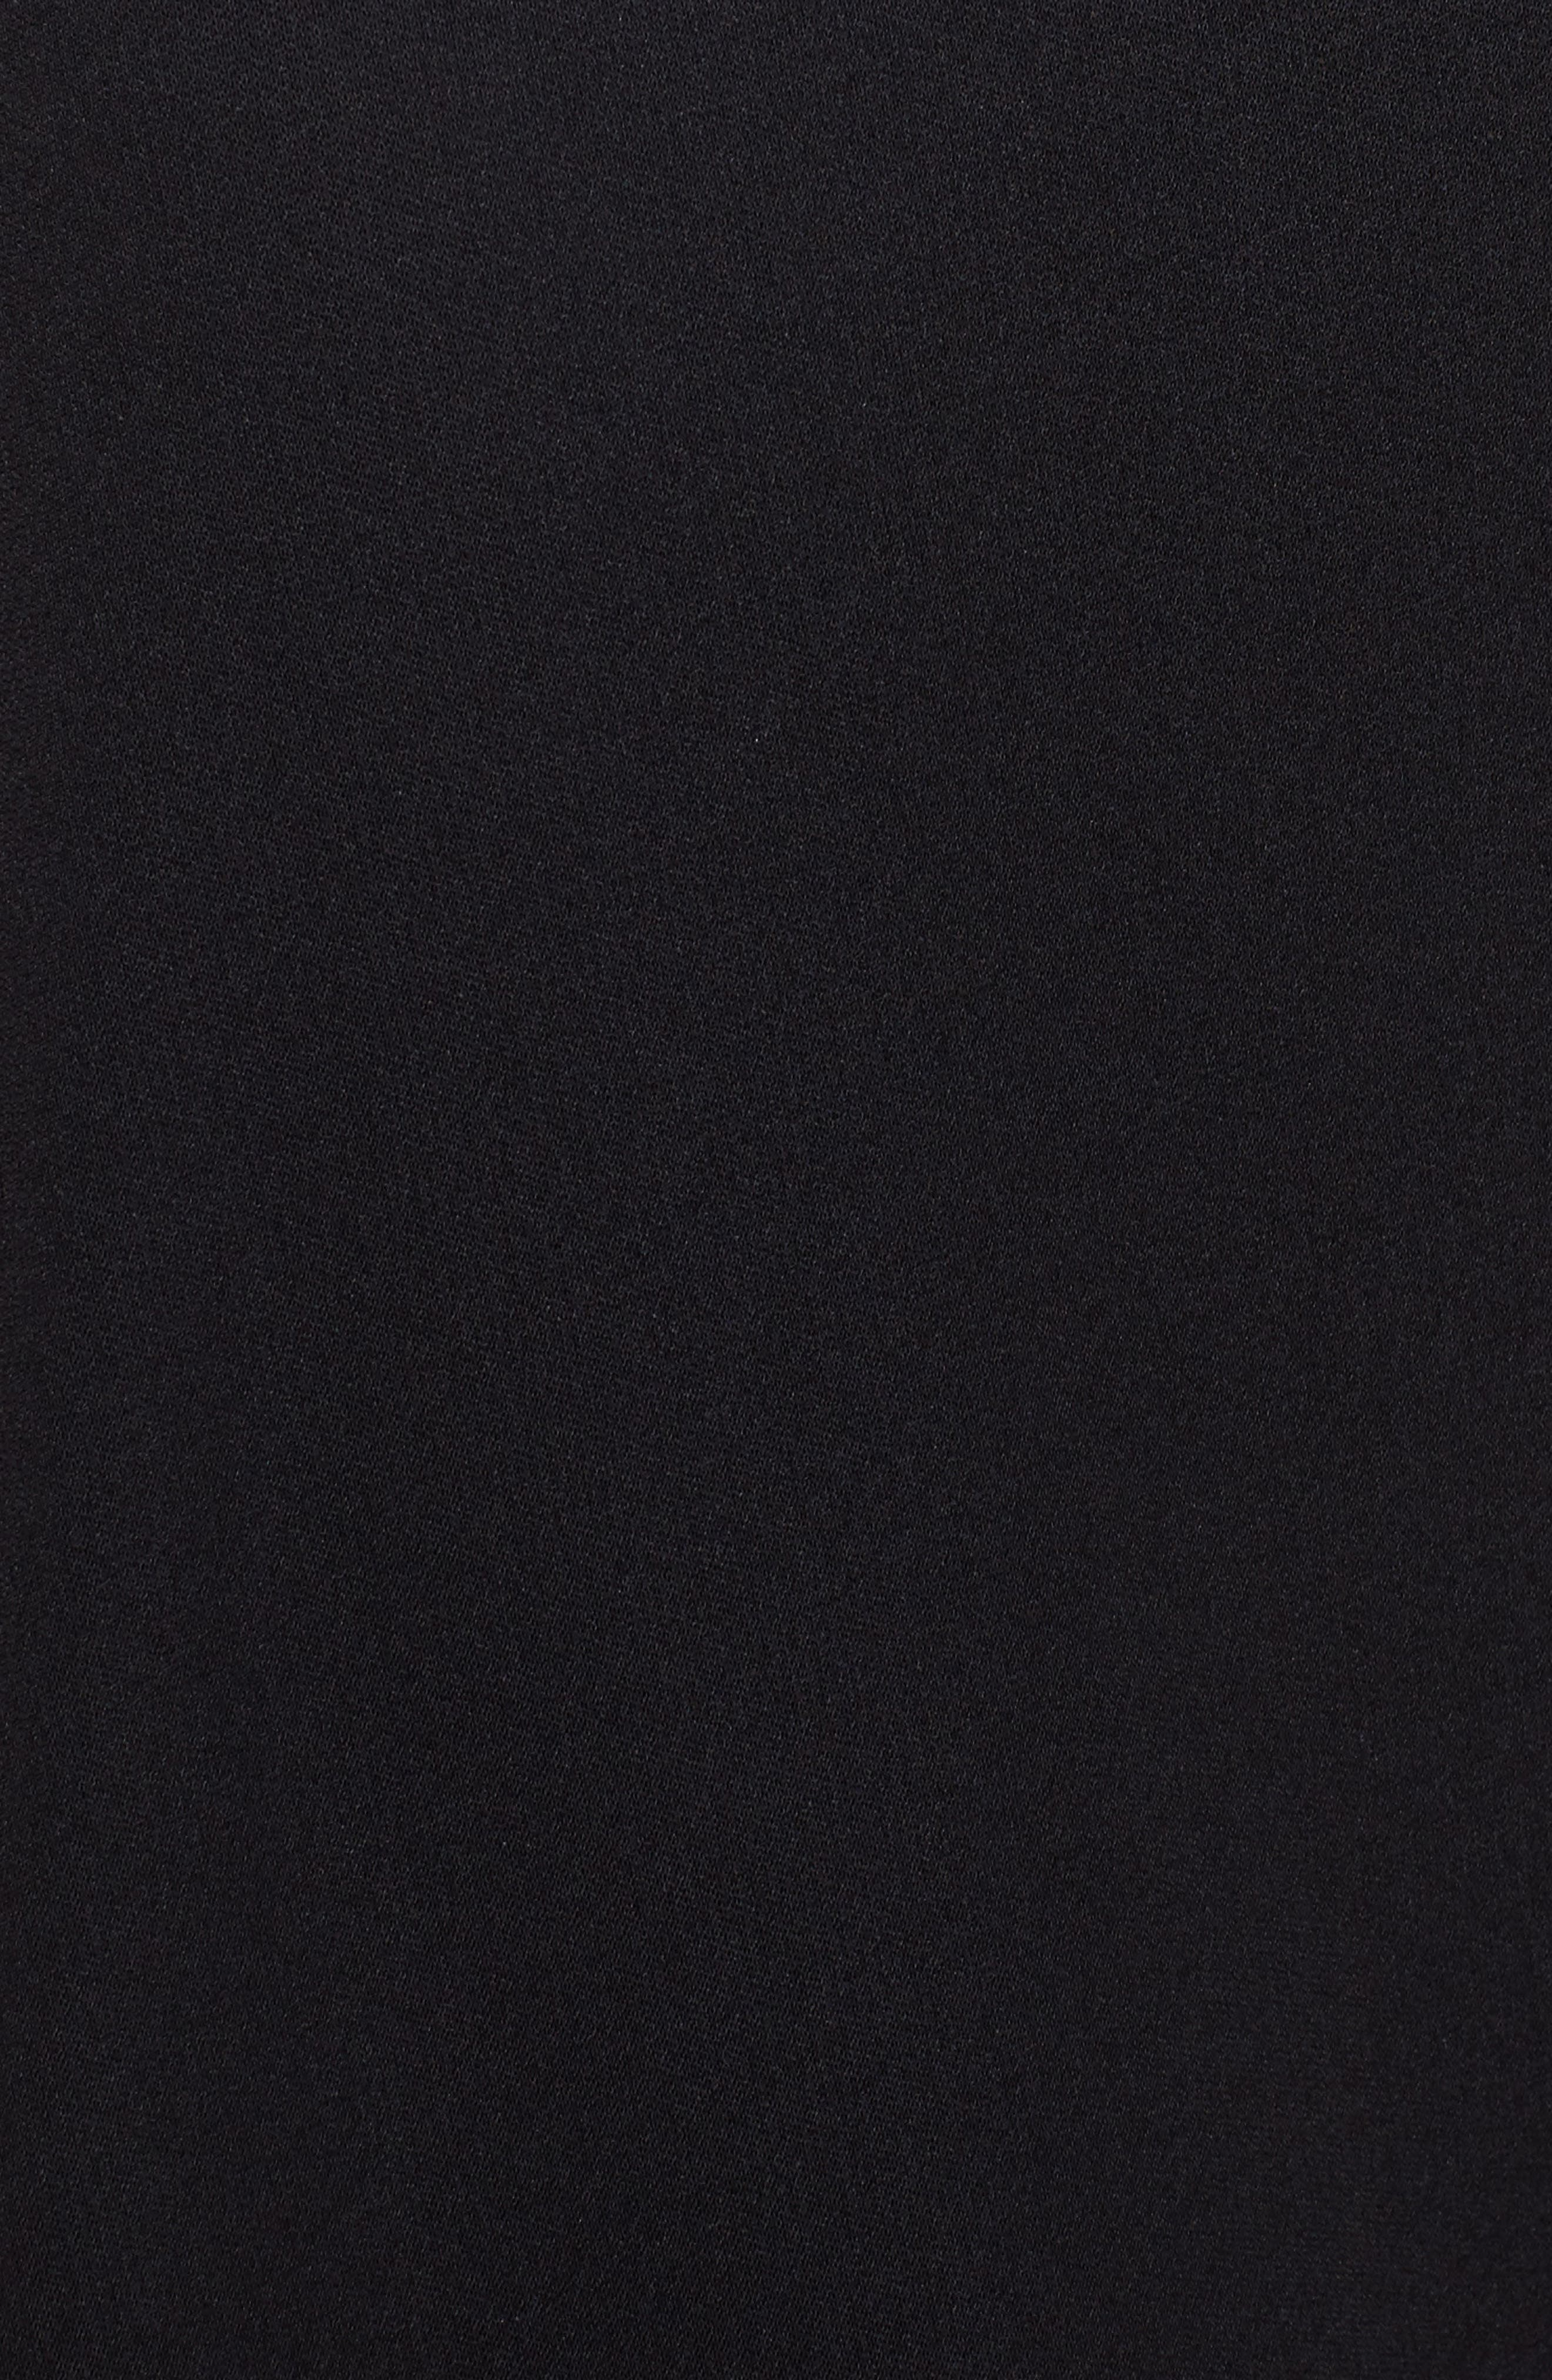 Jersey Wrap Dress,                             Alternate thumbnail 5, color,                             RICH BLACK